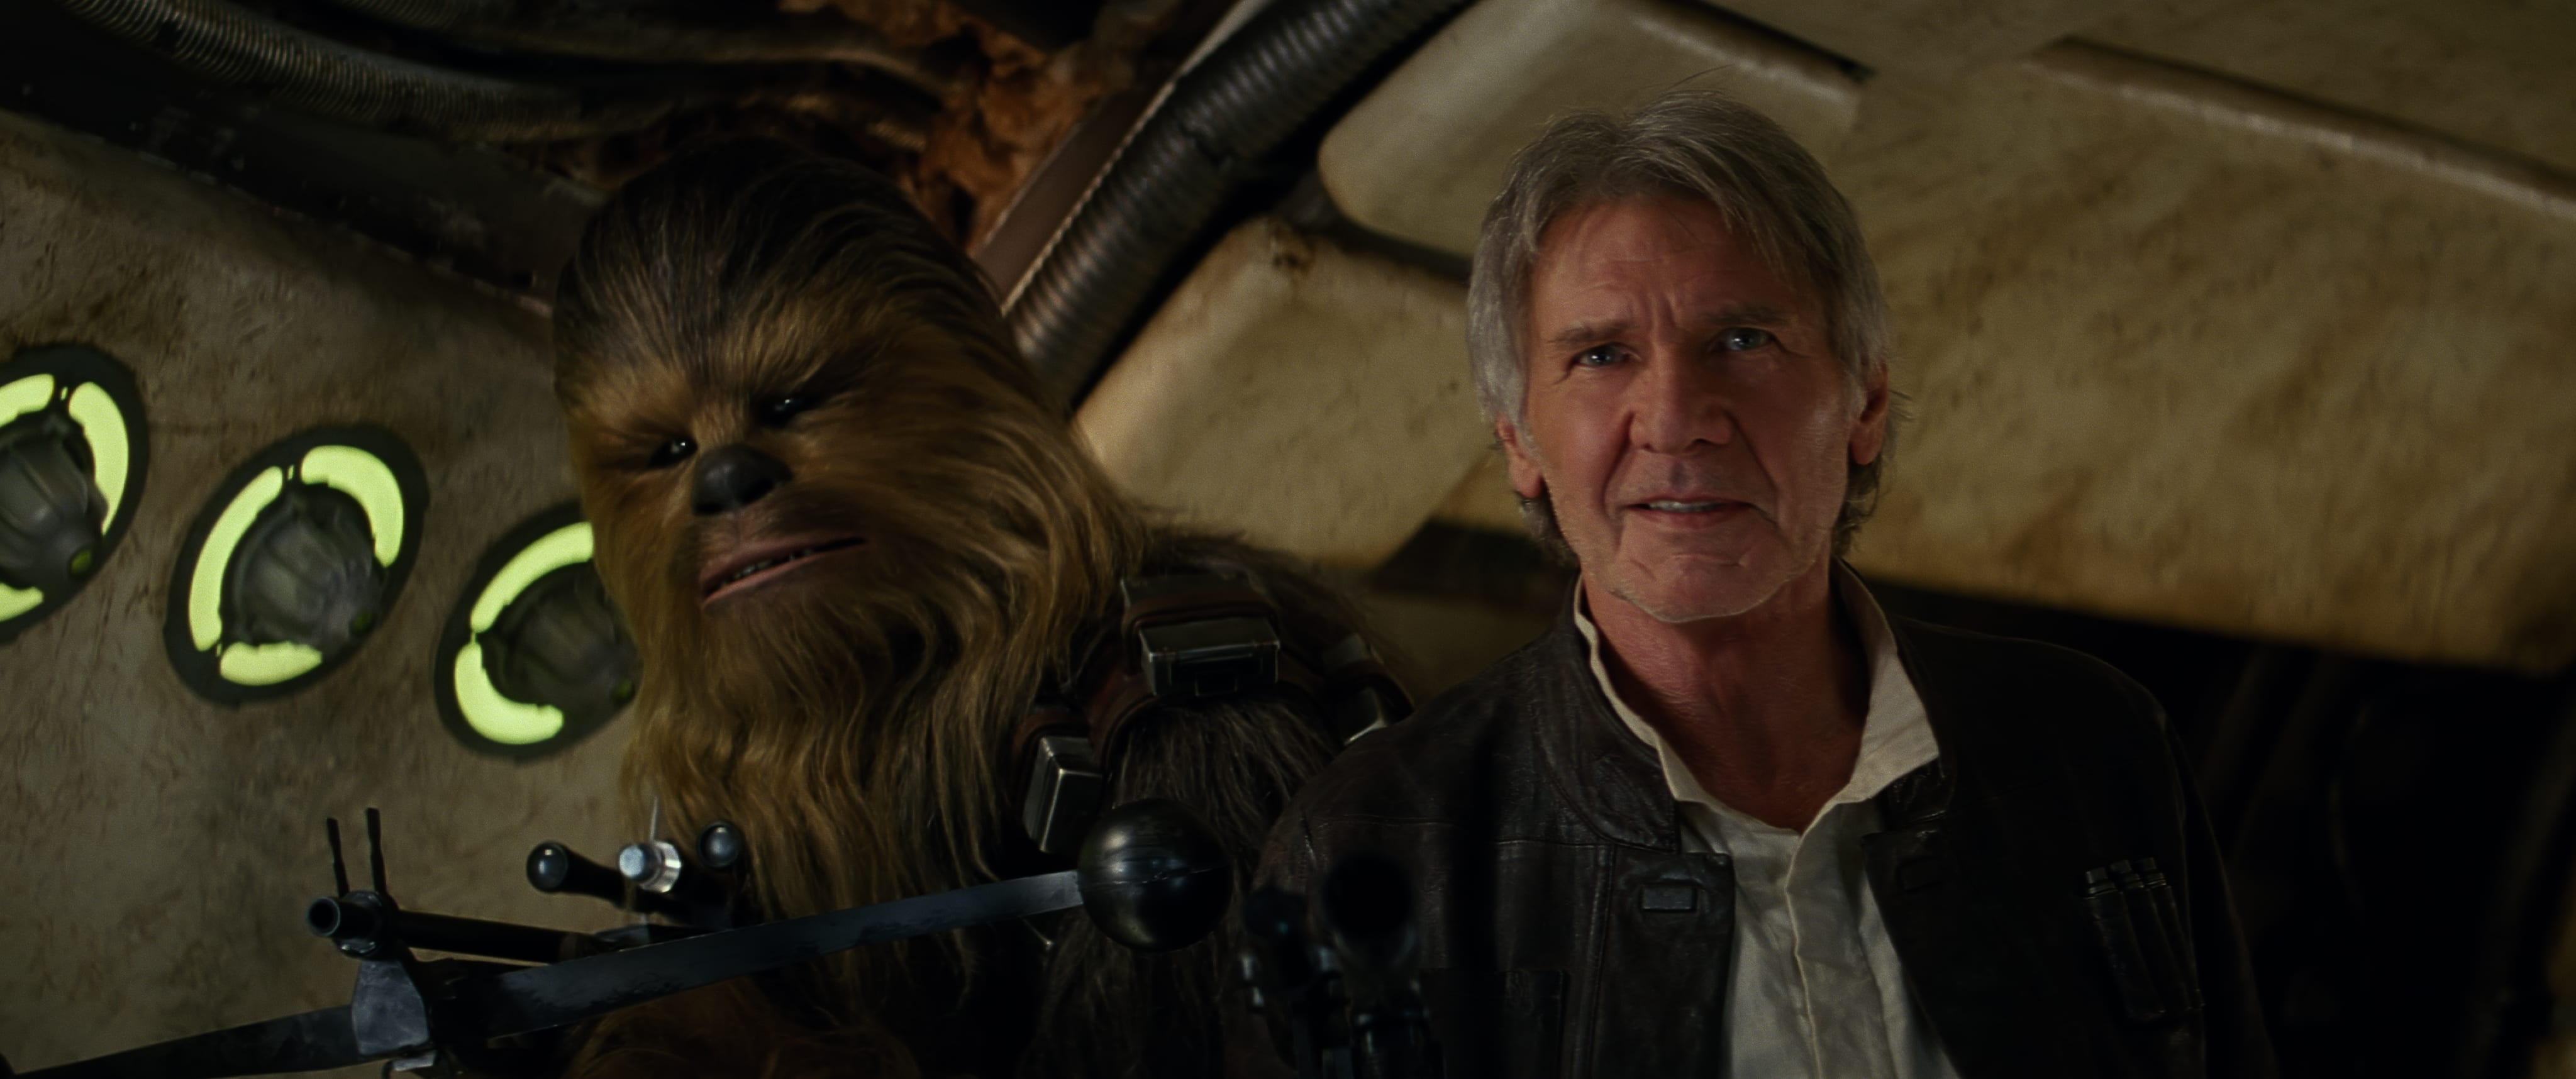 Star Wars Film: The Force AwakensPh: Film Frame©Lucasfilm 2015